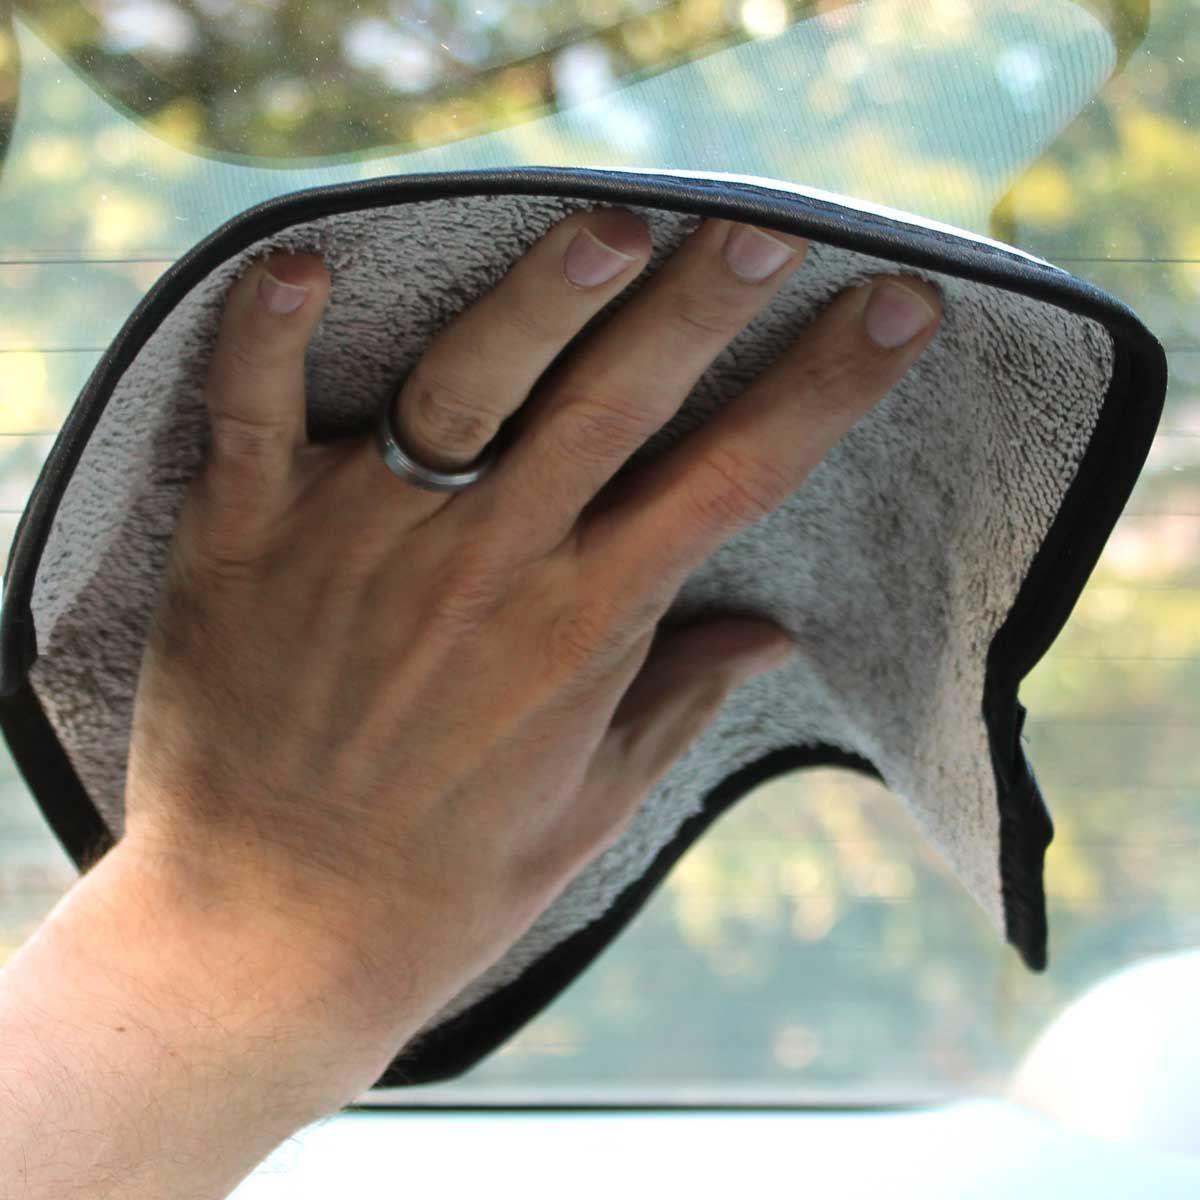 How To Clean Inside Car Windows Inside Car Clean Car Windows Inside Cleaning Car Windows